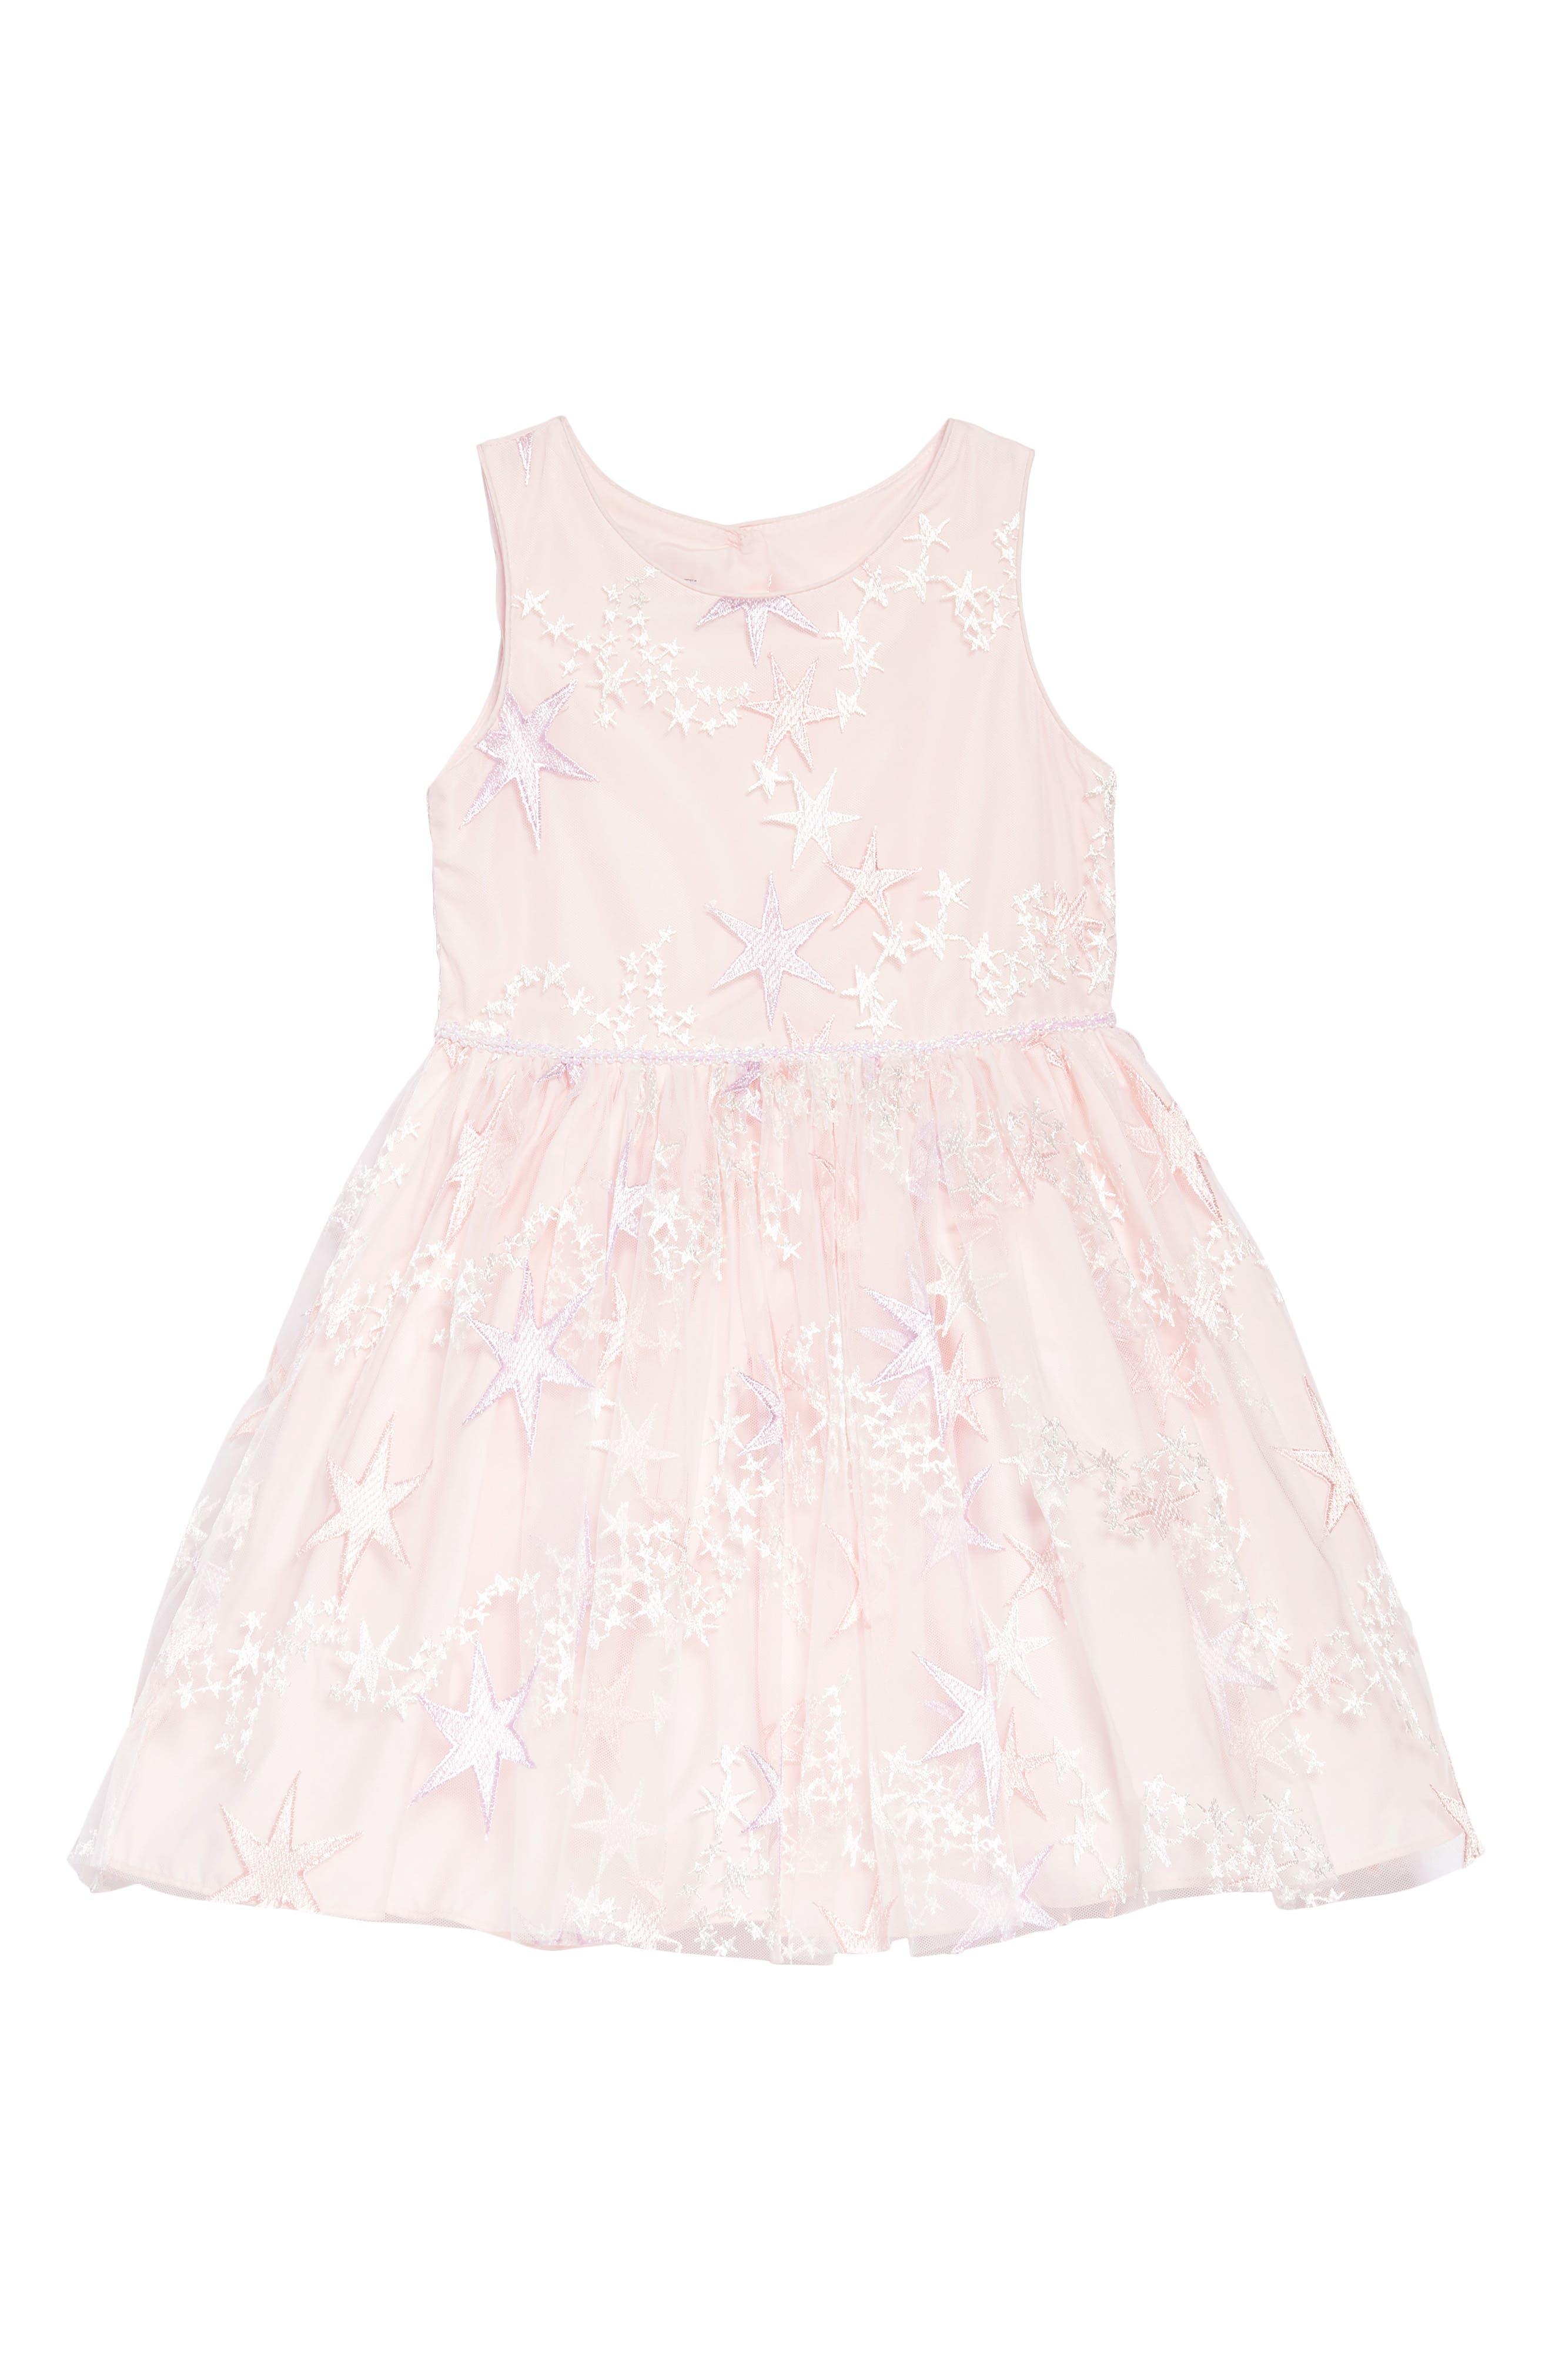 Pippa & Julie Embroidered Star Dress (Toddler Girls, Little Girls & Big Girls)